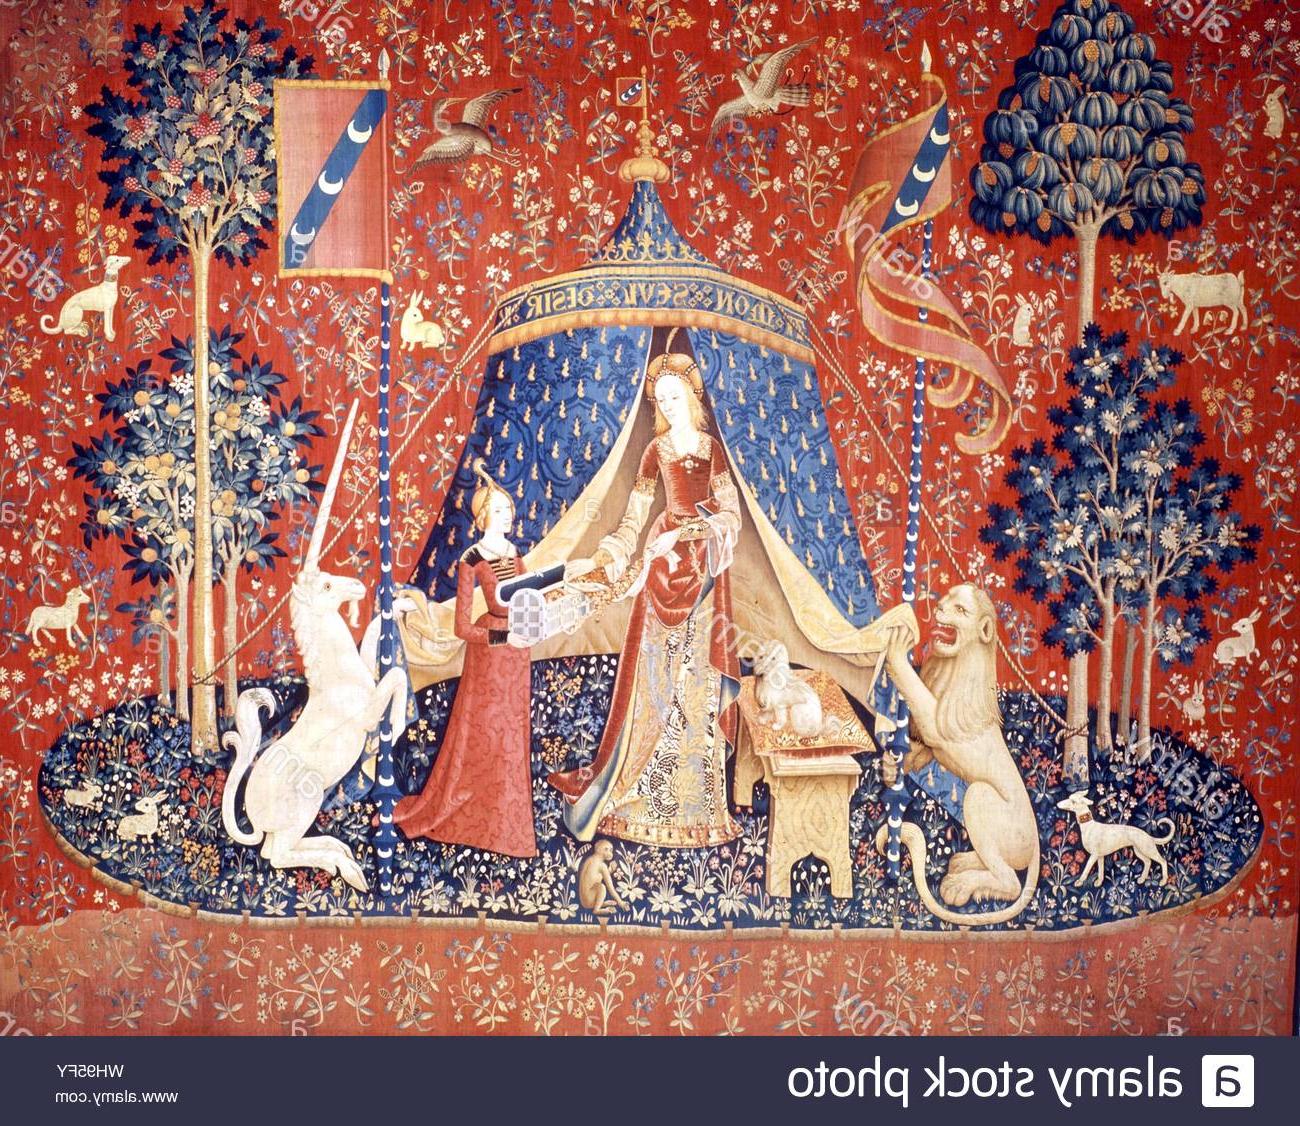 Current Dame A La Licorne I Tapestries Intended For Tapestry: C.1509 13. La Dame A La Licorne (View 10 of 20)